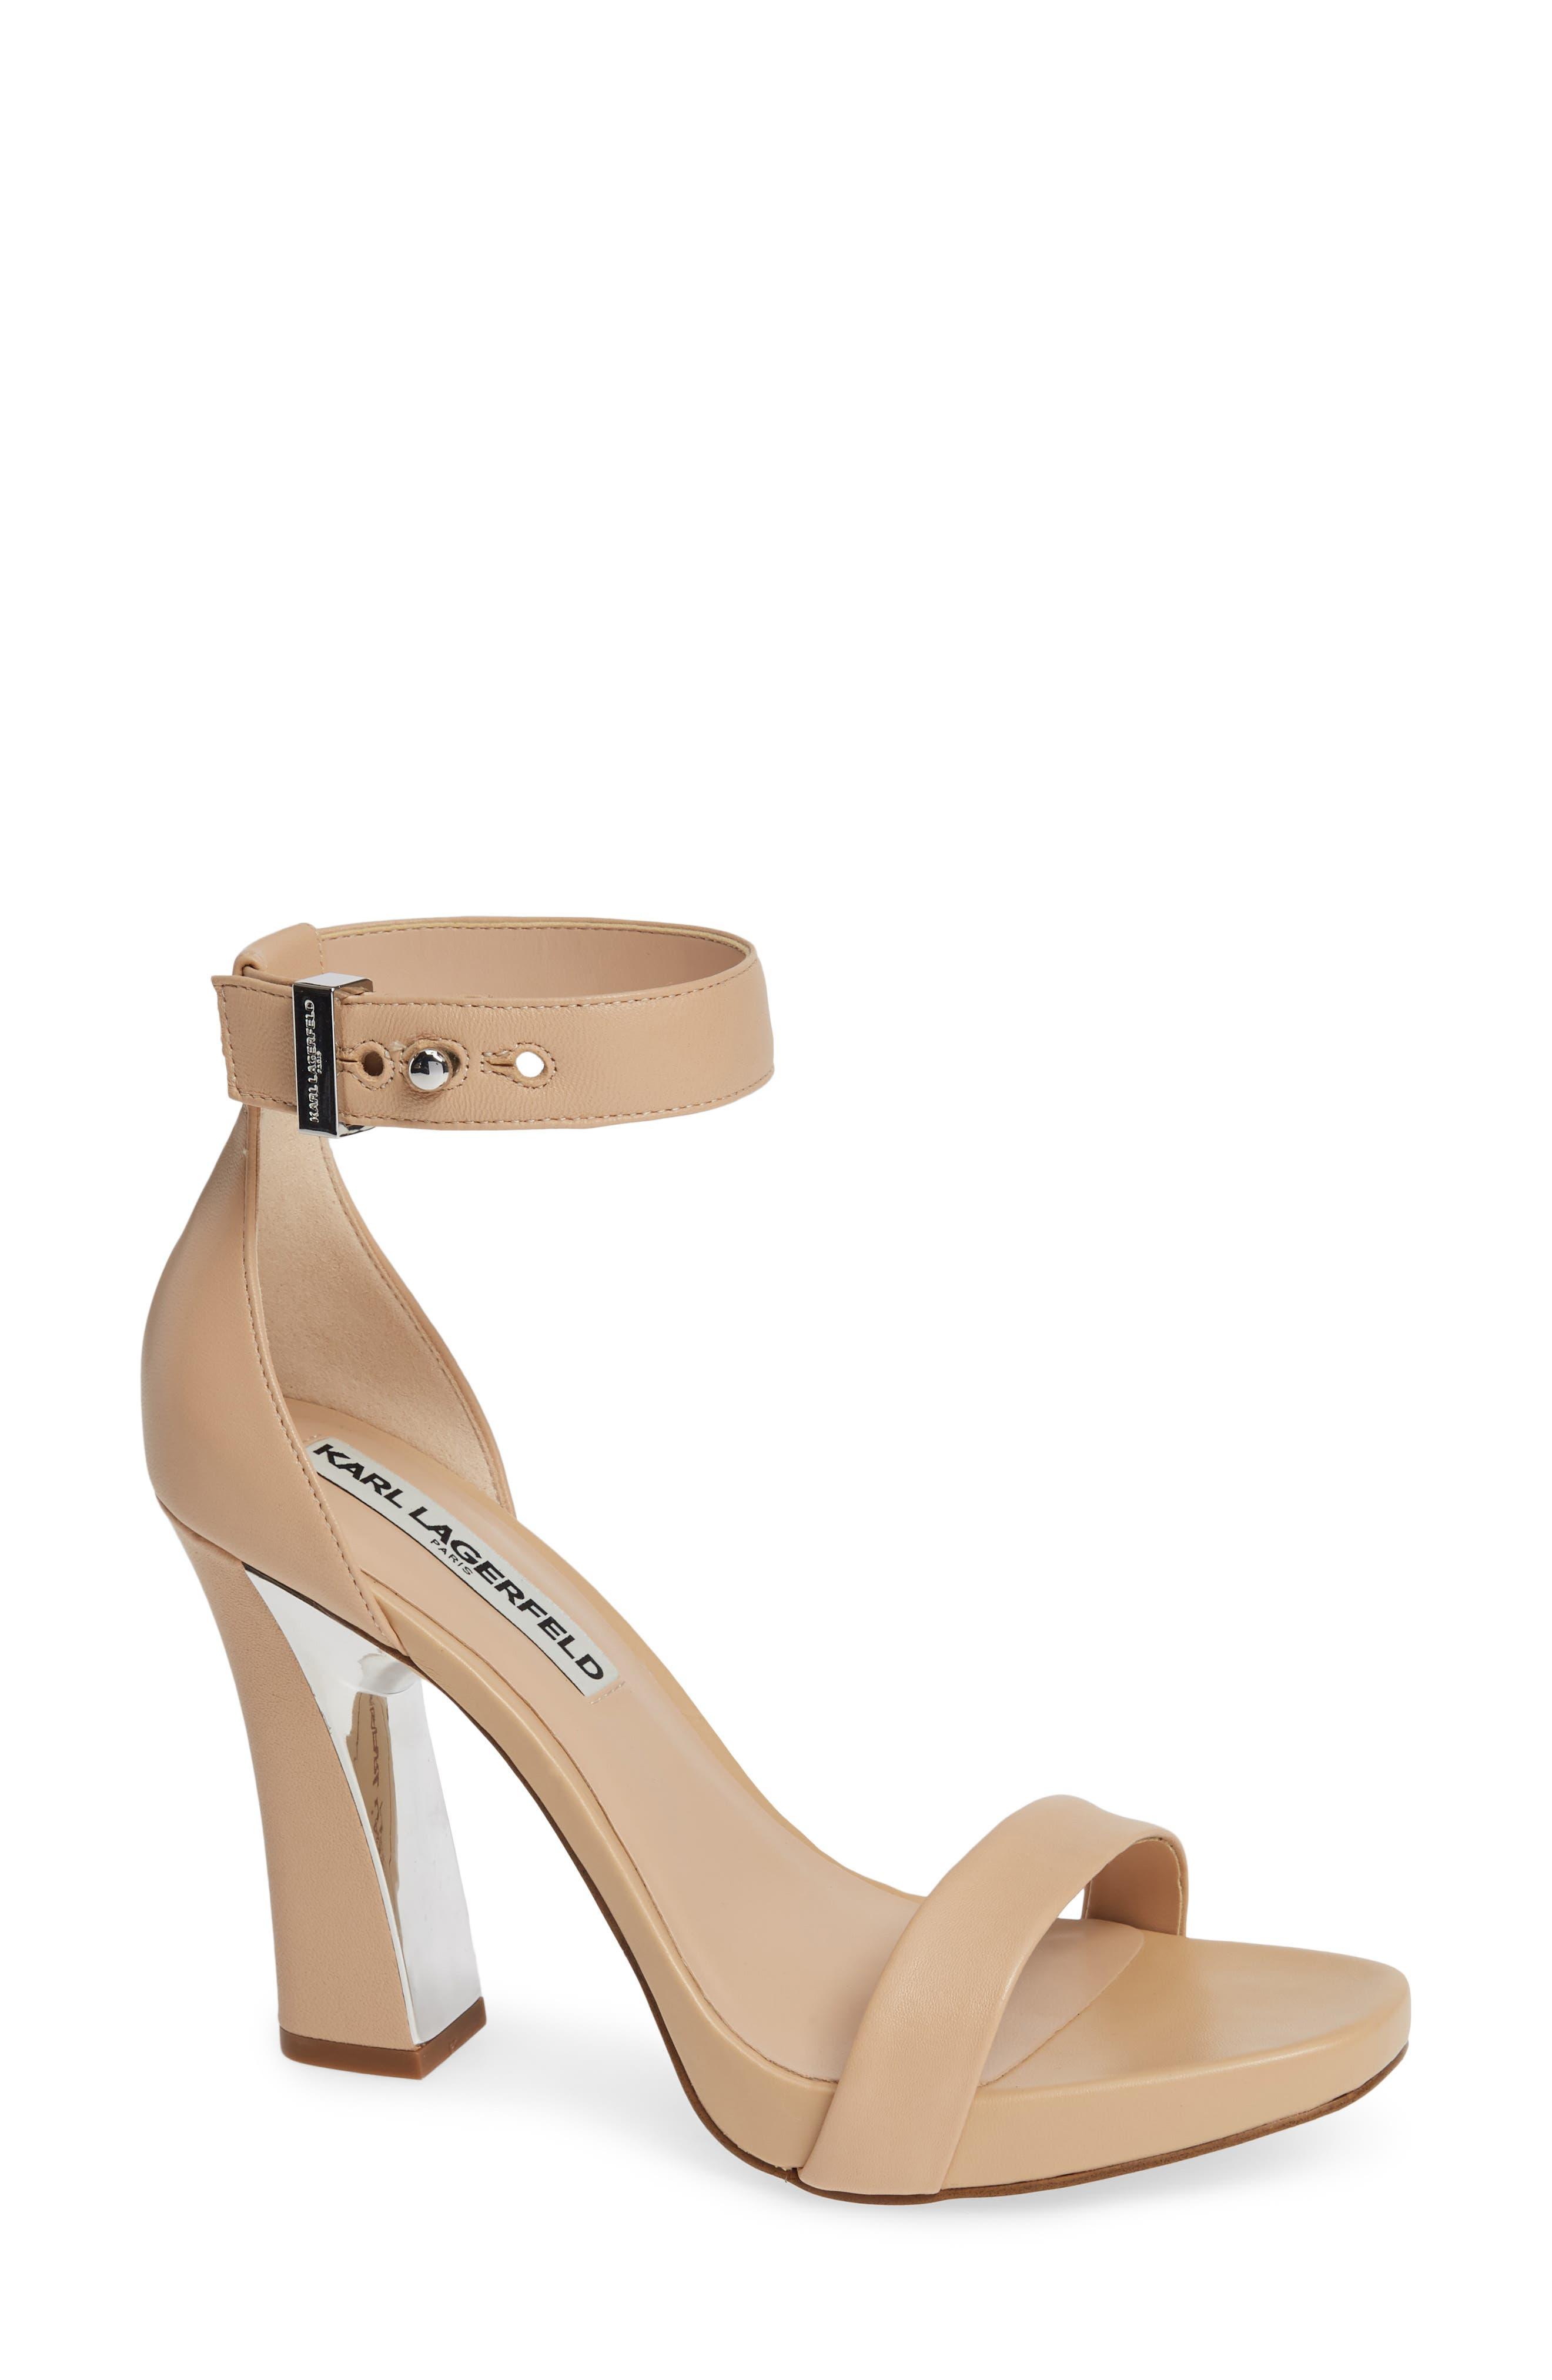 a273580d5c1 Karl Lagerfeld Paris Ankle Strap Sandals for Women